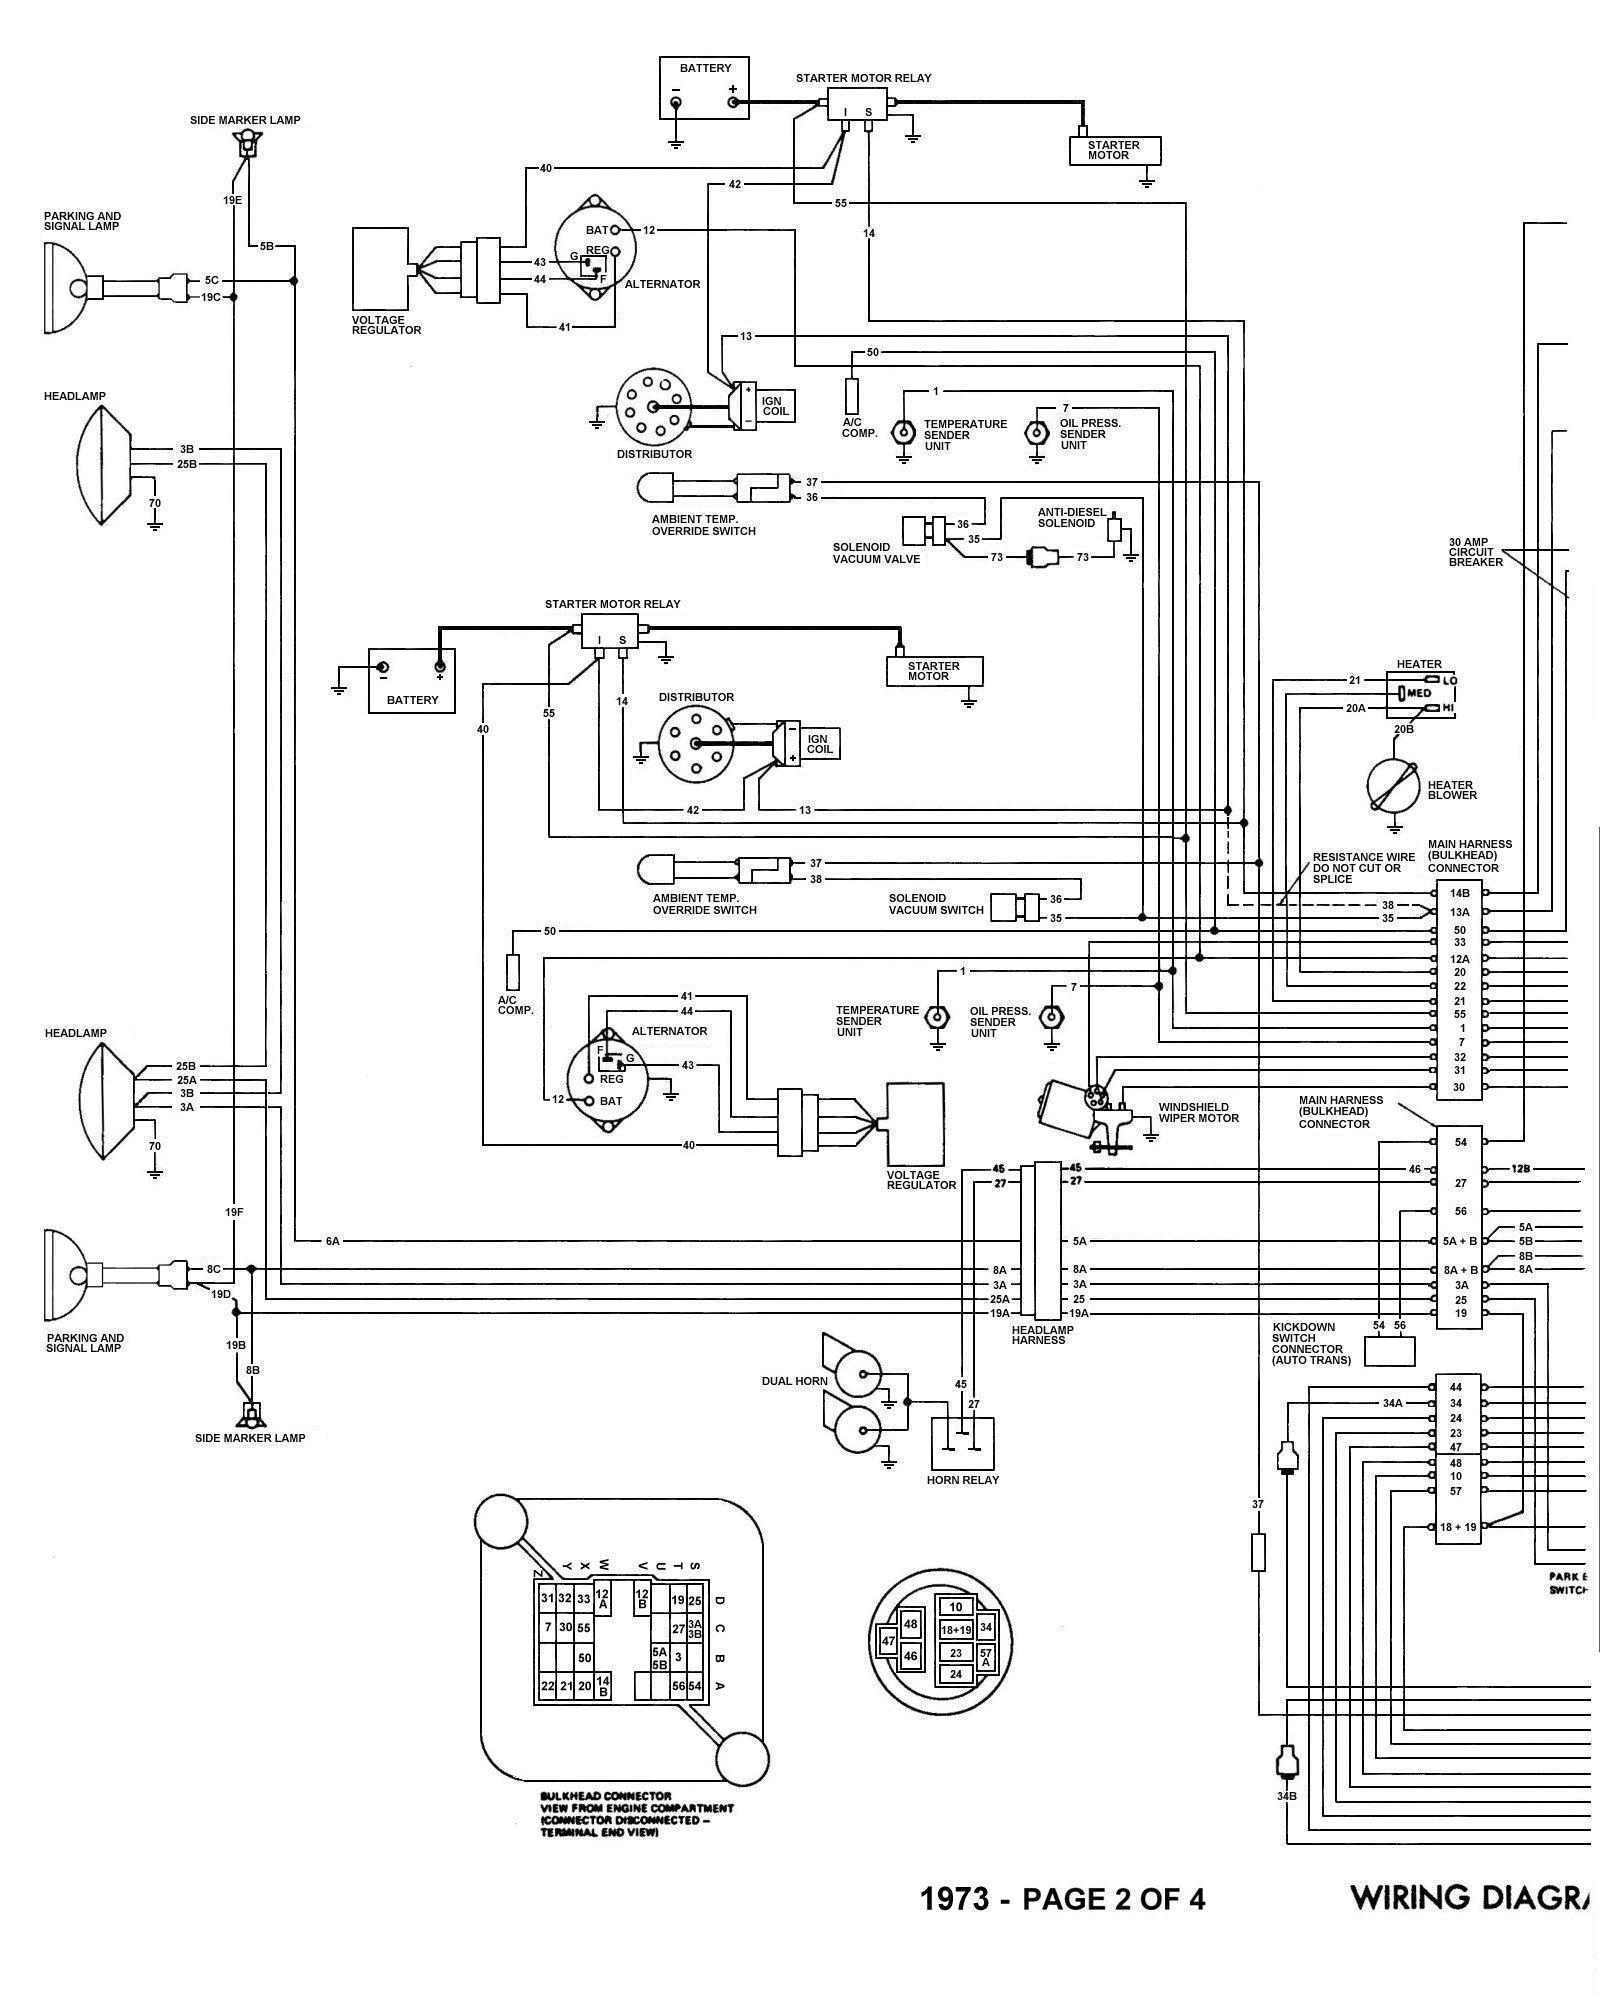 Signal Stat 900 Sigflare Wiring Diagram